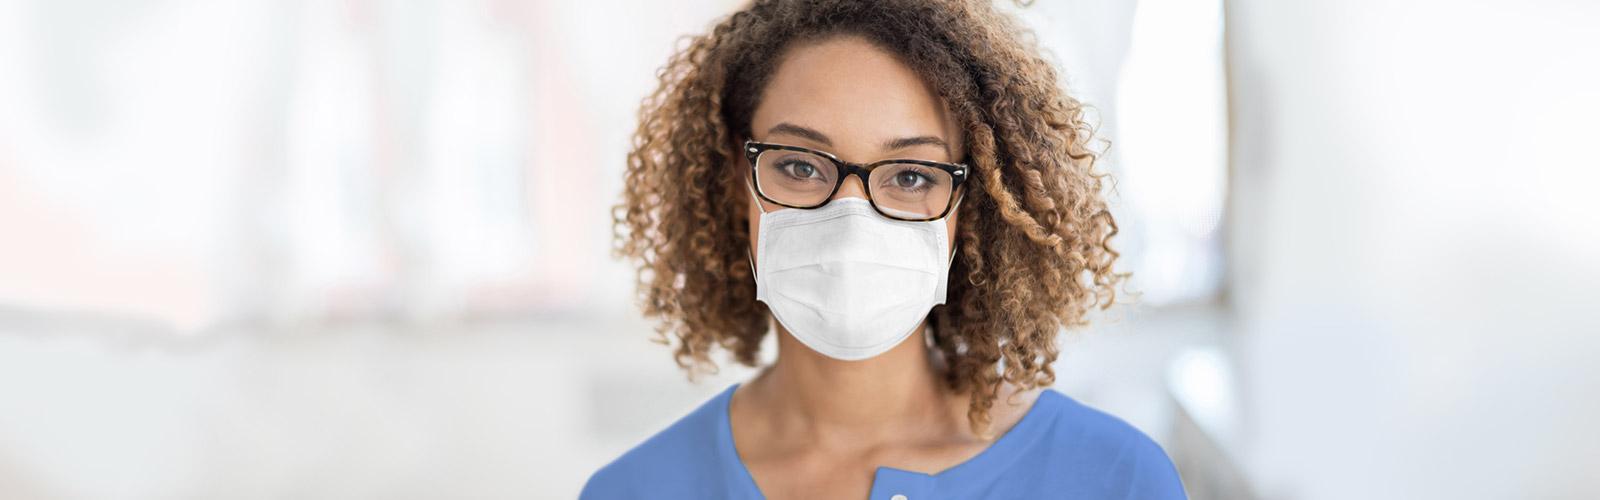 Nurse wearing a face mask